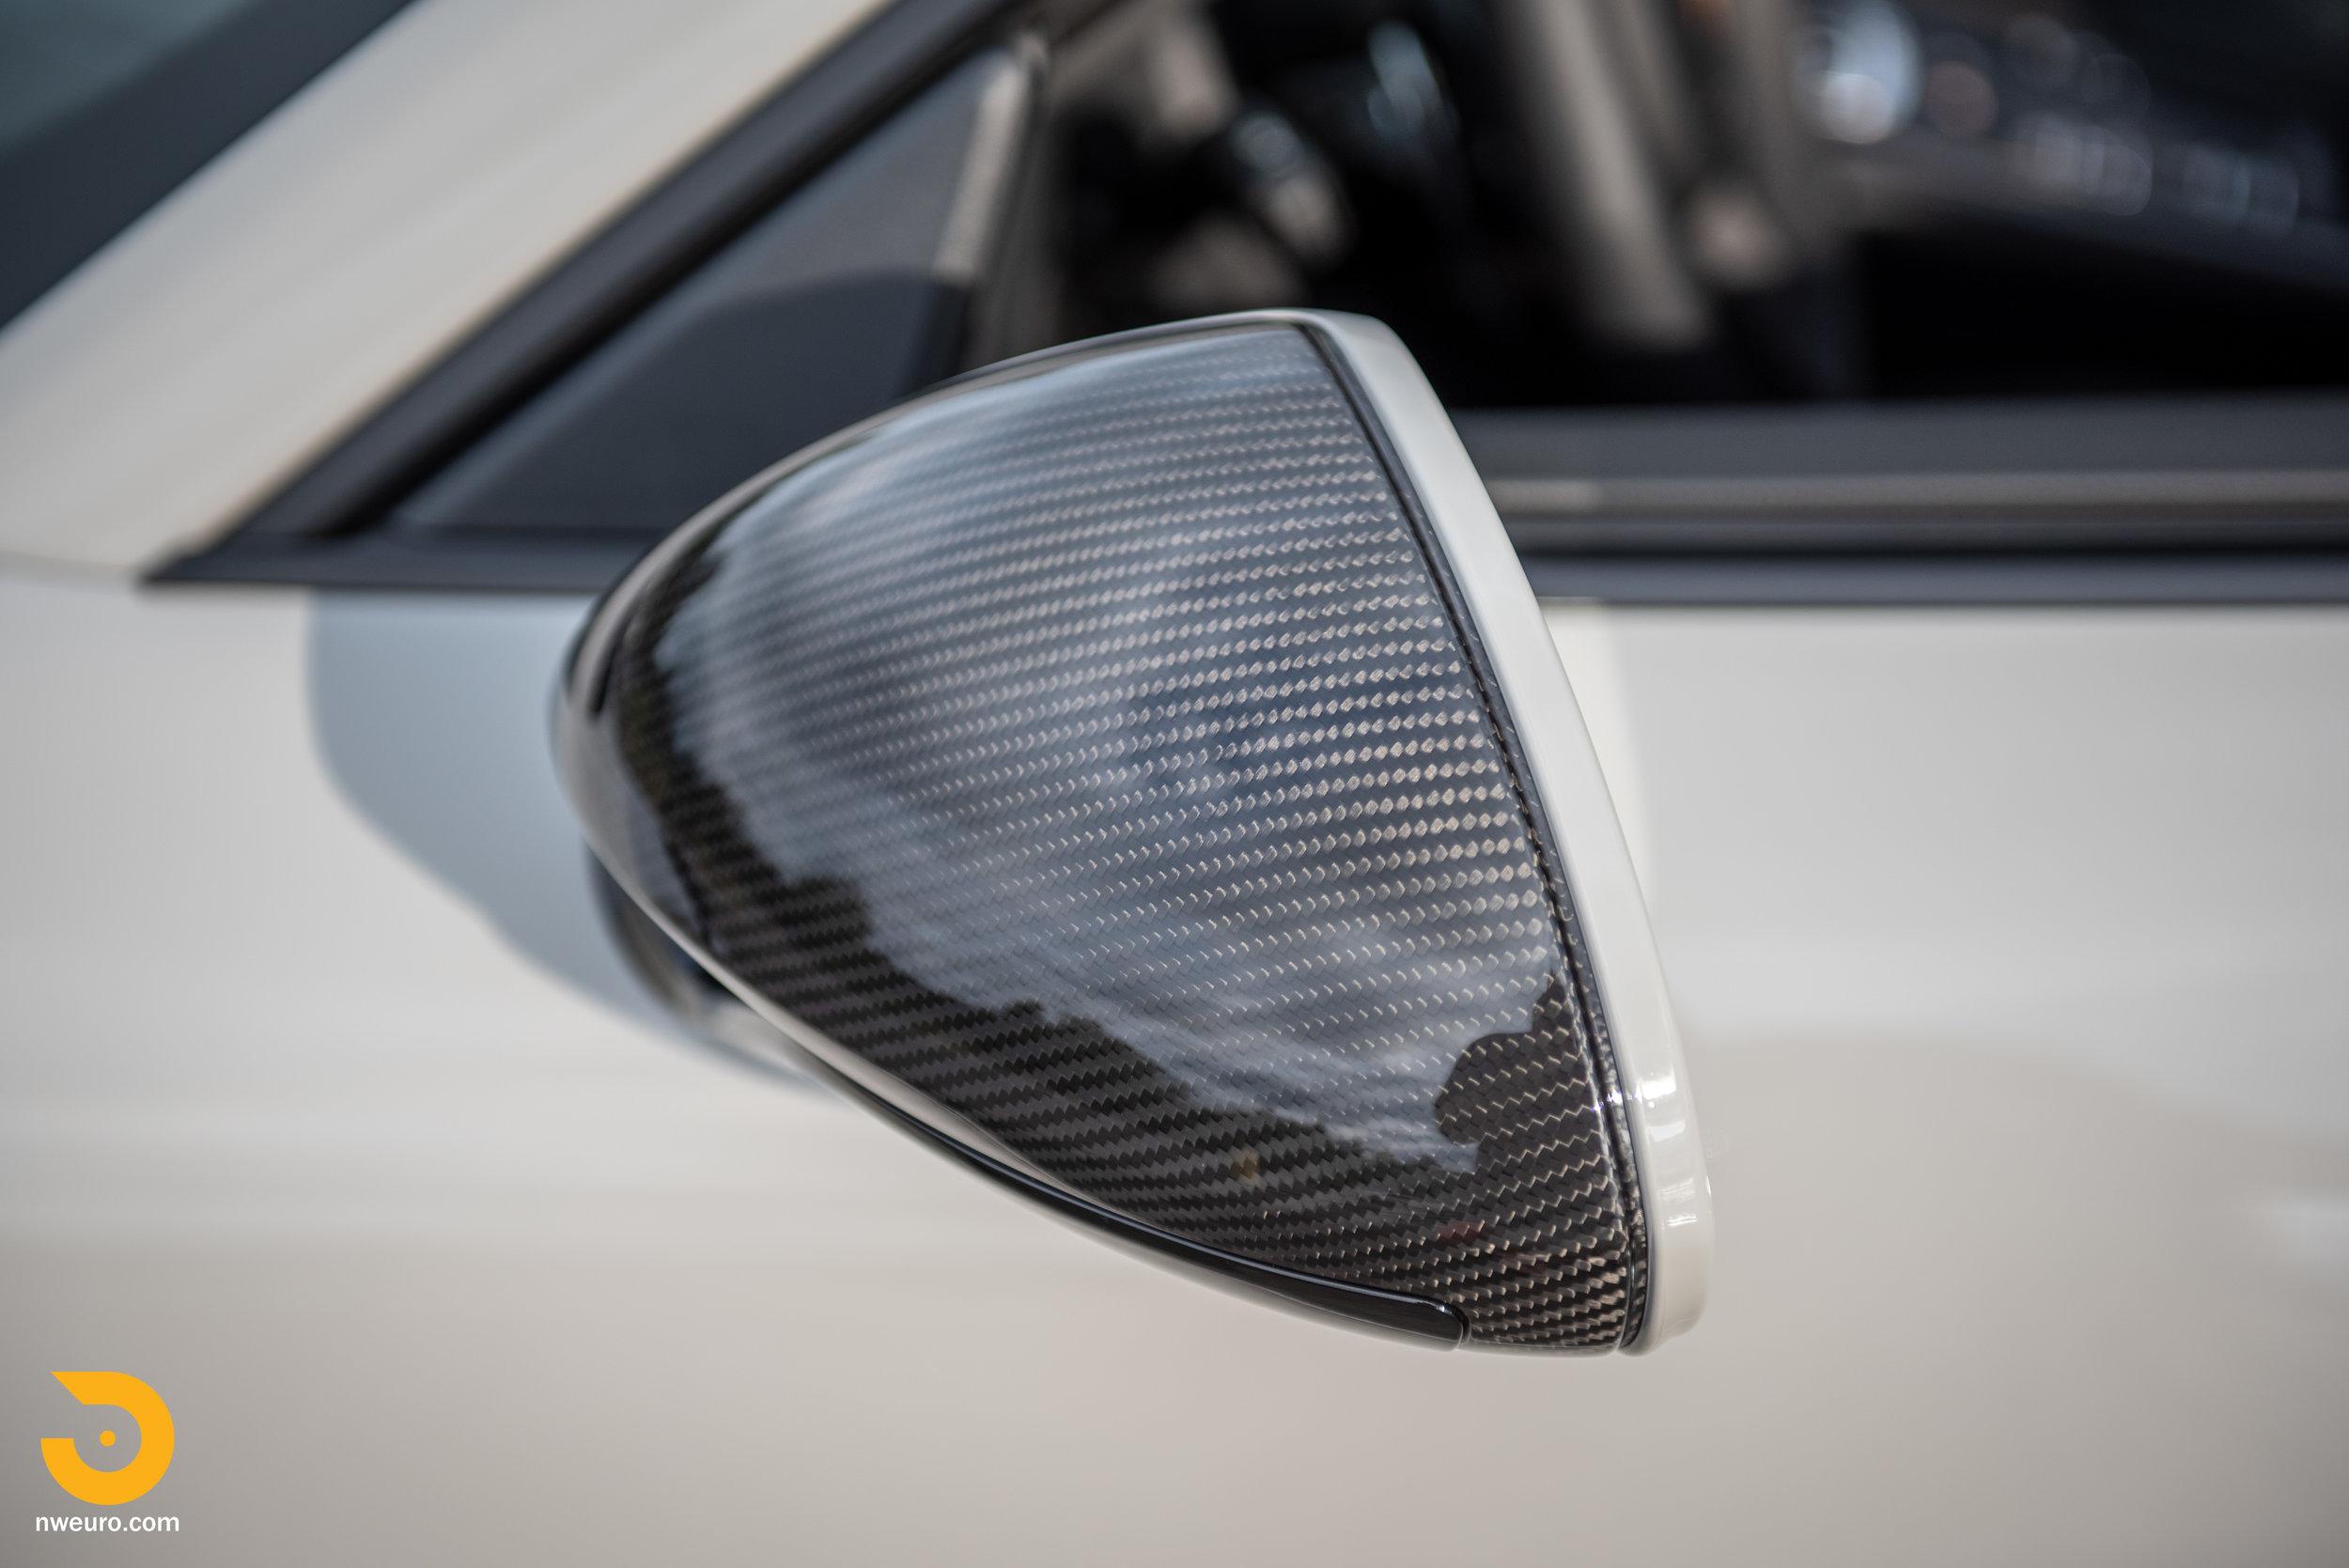 2019 Porsche GT3 RS - Chalk-19.jpg